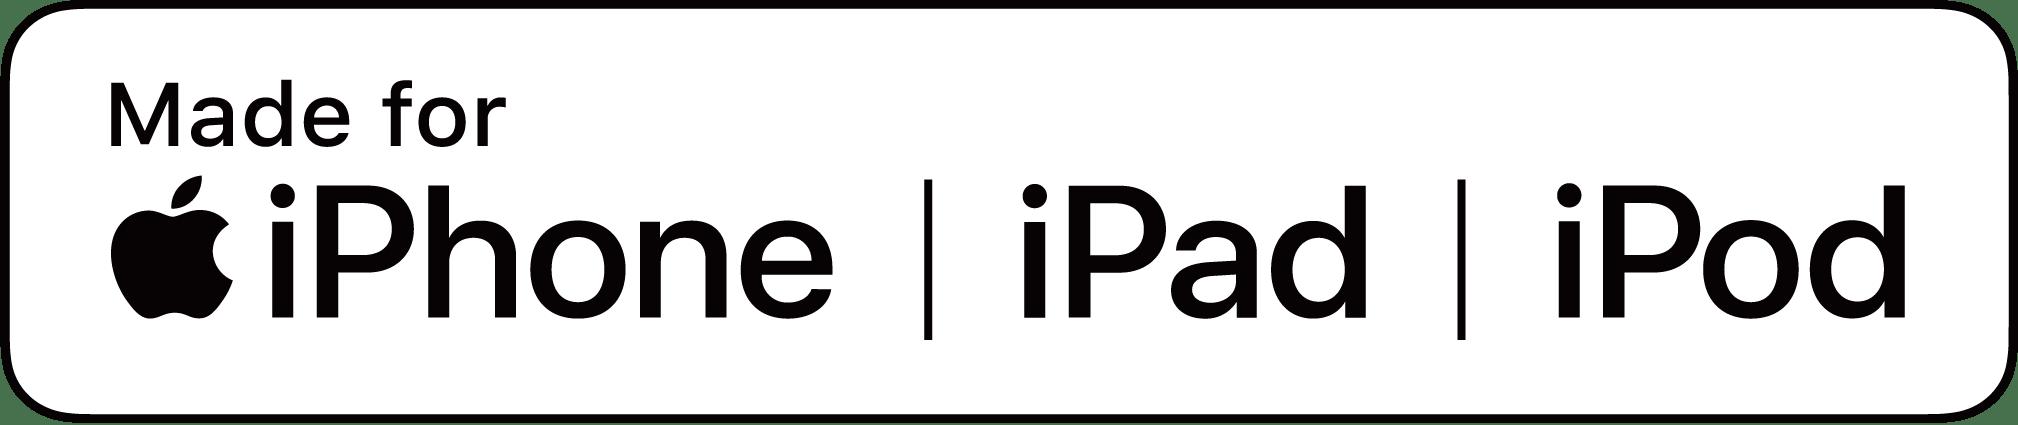 made for iphone. ipad. ipod